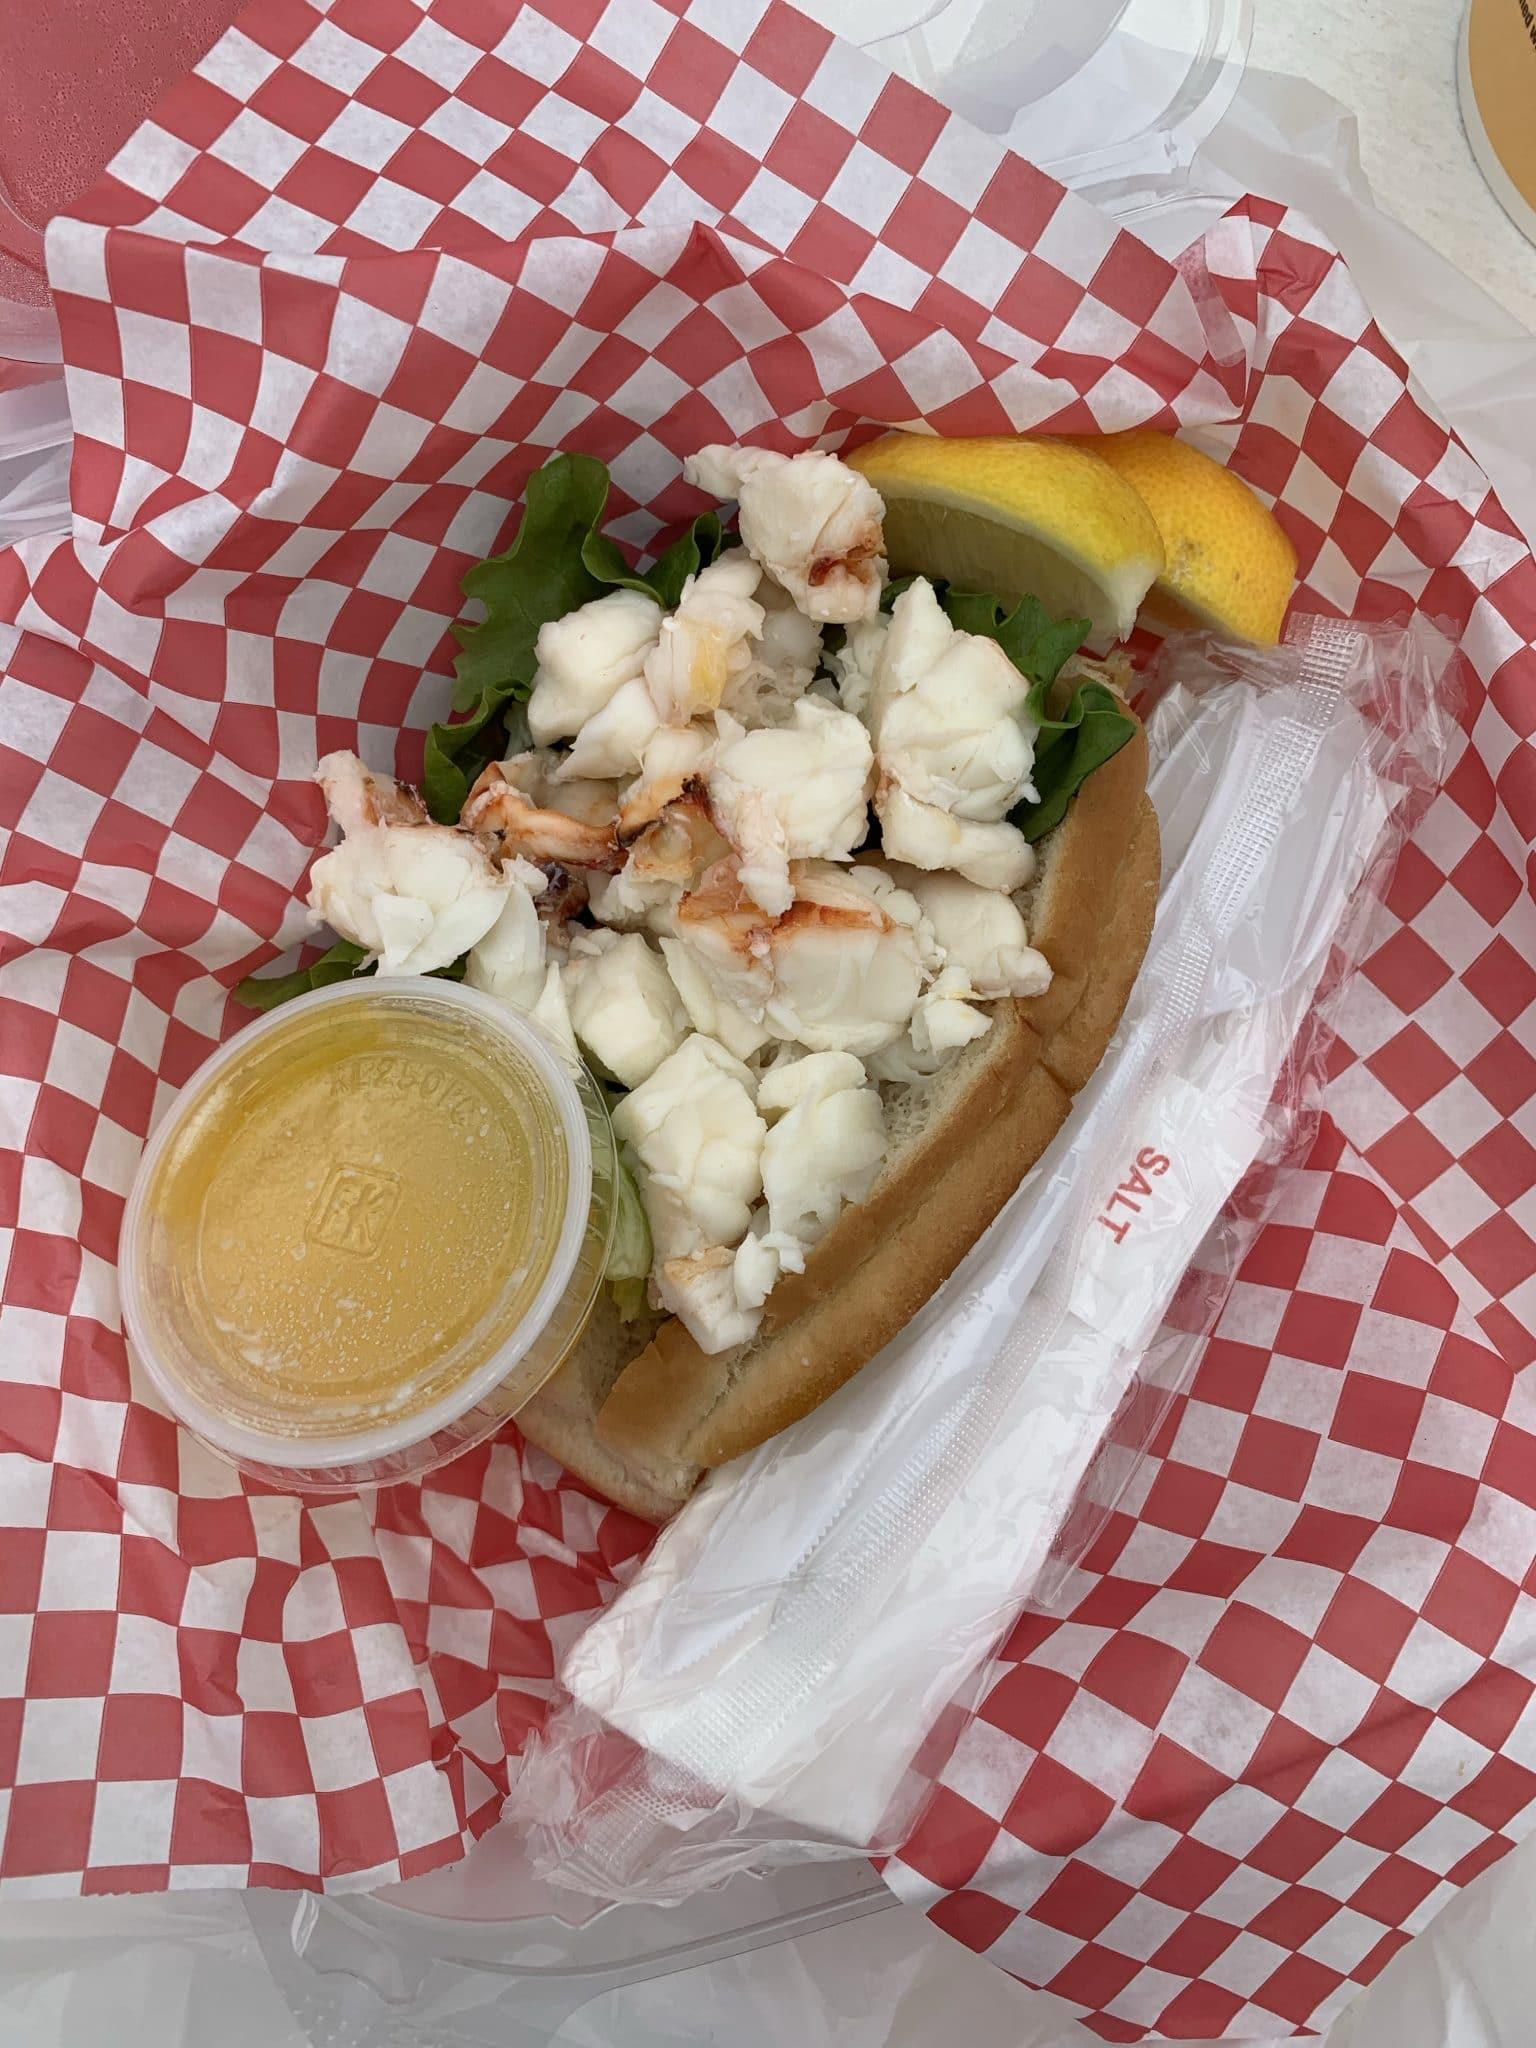 Shrimp Shack, Seaside, 30A, Destin, Florida vacation 2021, Stilettos and Diapers